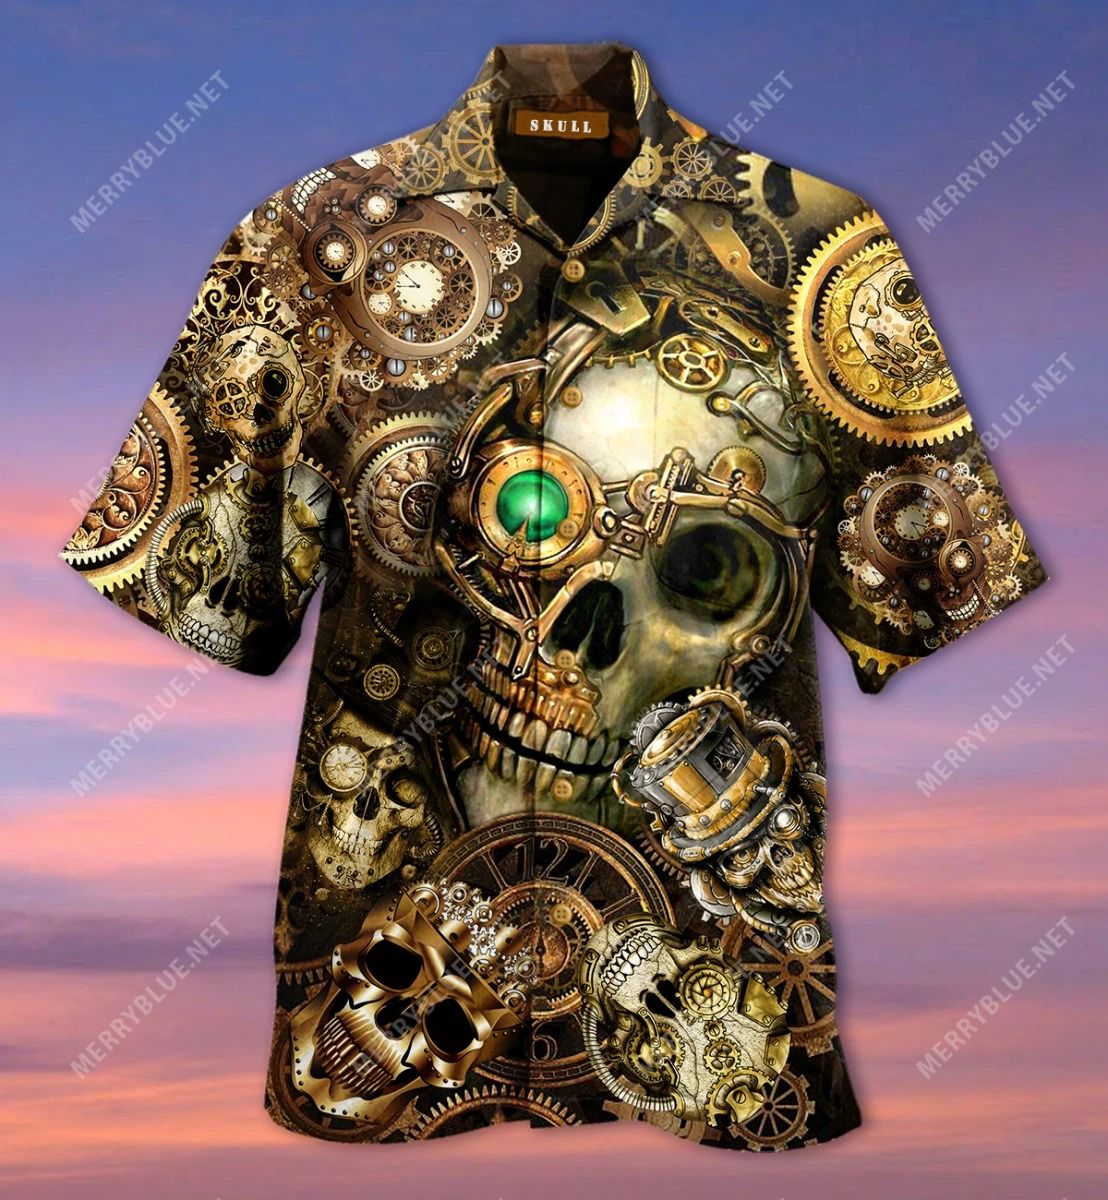 Amazing Steampunk Skull Hawaiian Shirt